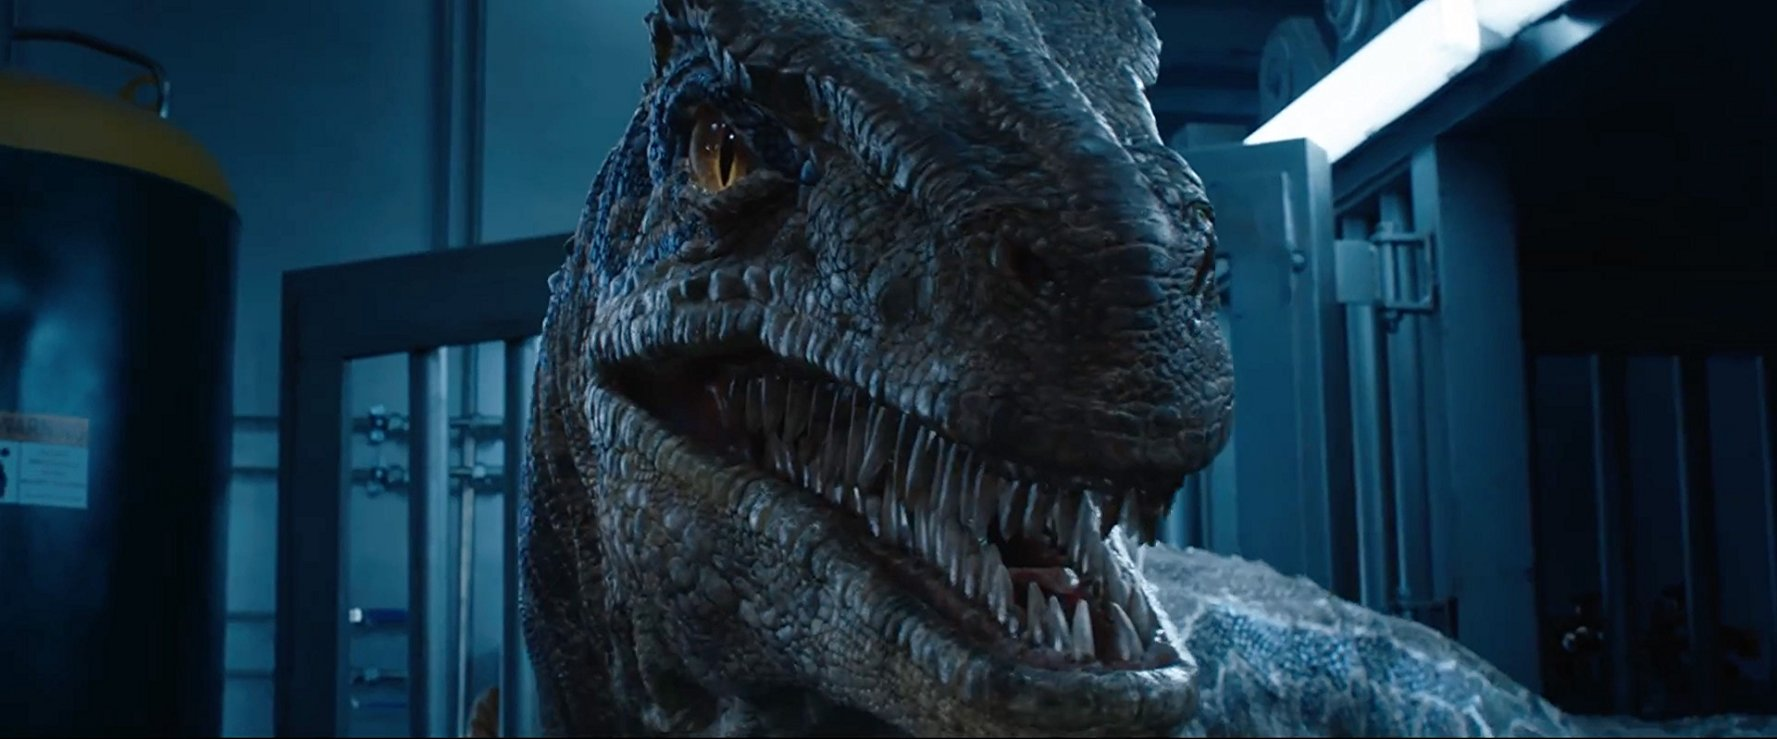 JurassicImage1.jpg